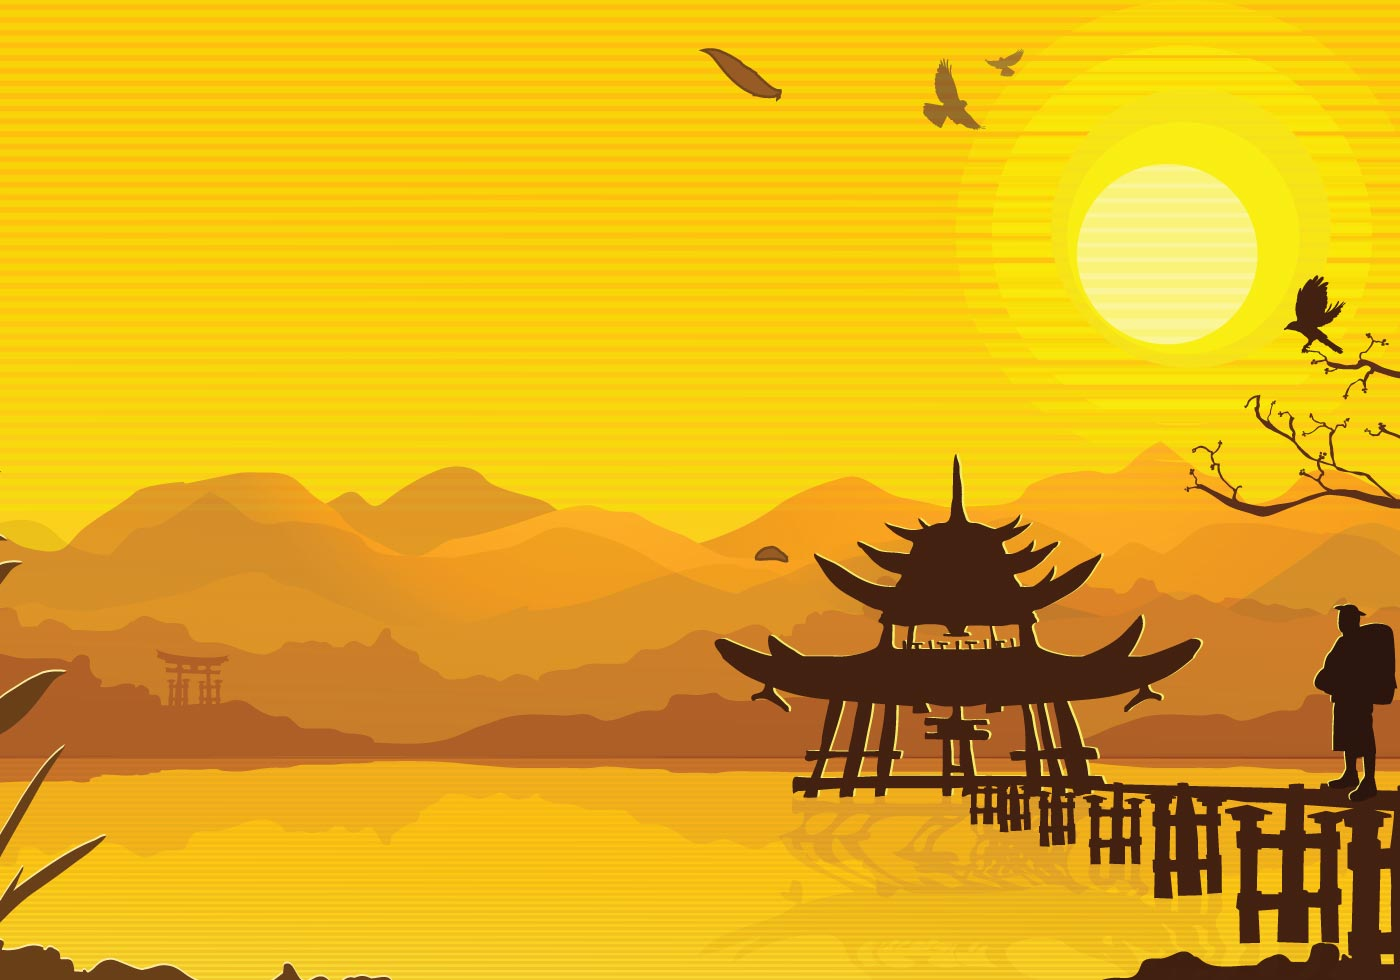 Oriental HD wallpapers, Desktop wallpaper - most viewed